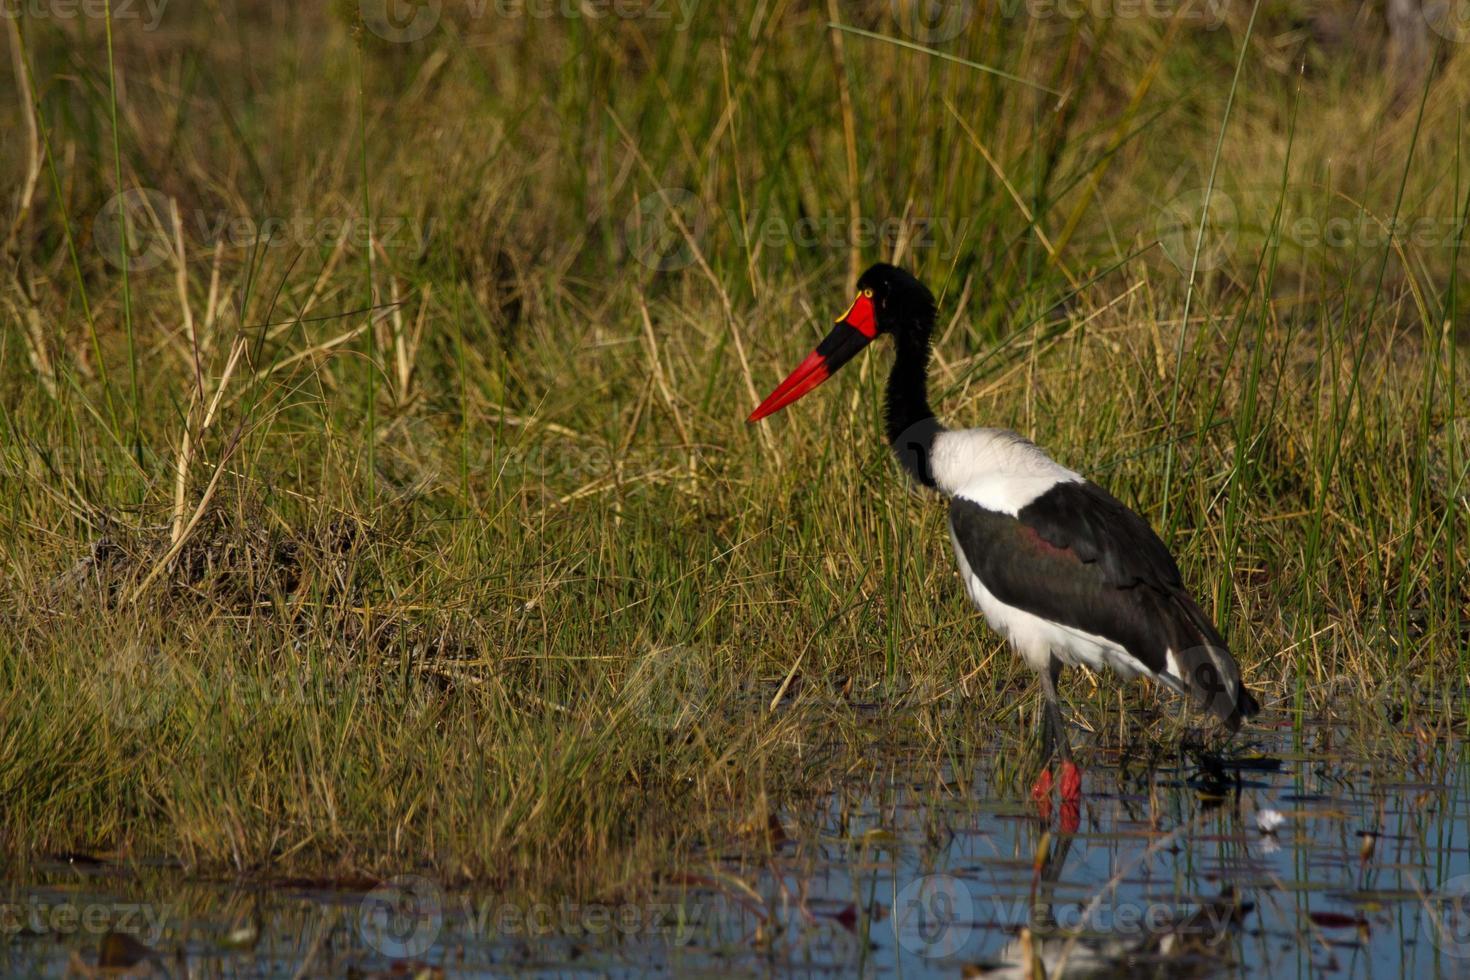 Saddle-billed stork photo